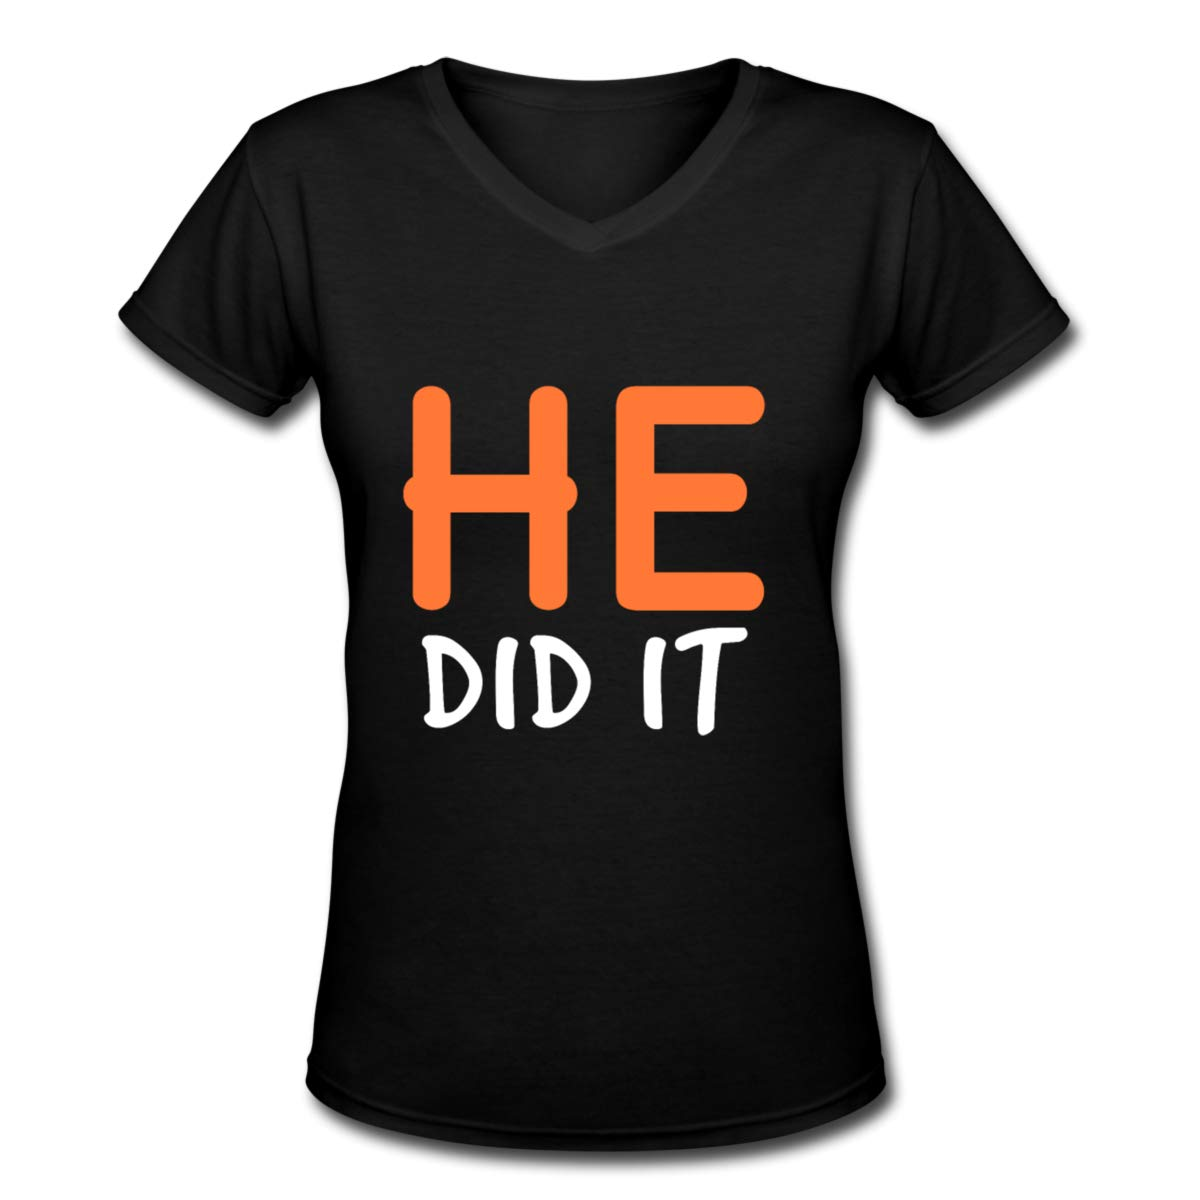 He Did It Women V-Neck Short Sleeve Tshirt